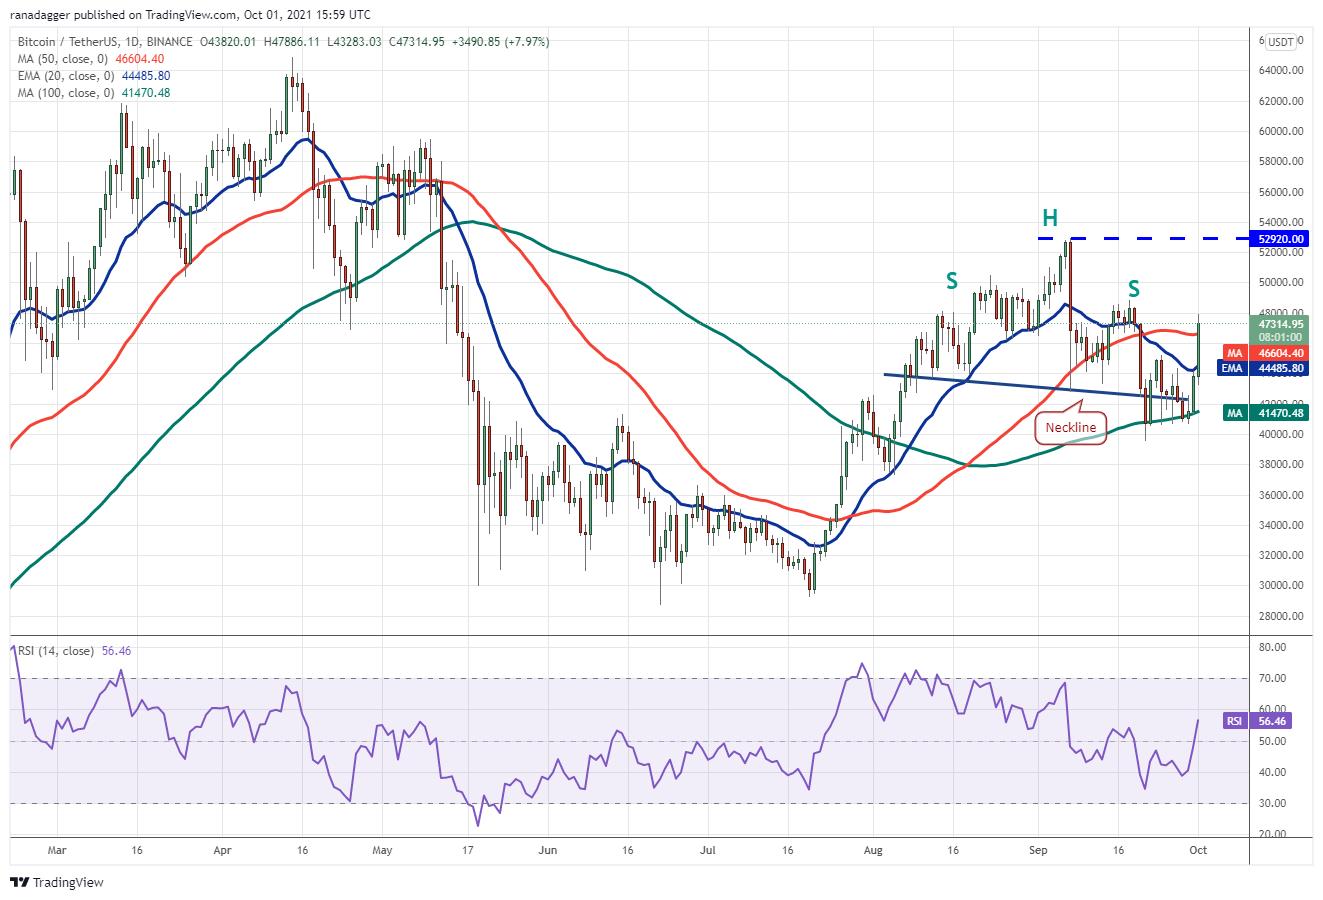 Price analysis 10/1: BTC, ETH, ADA, BNB, XRP, SOL, DOT, DOGE, LUNA, UNI2